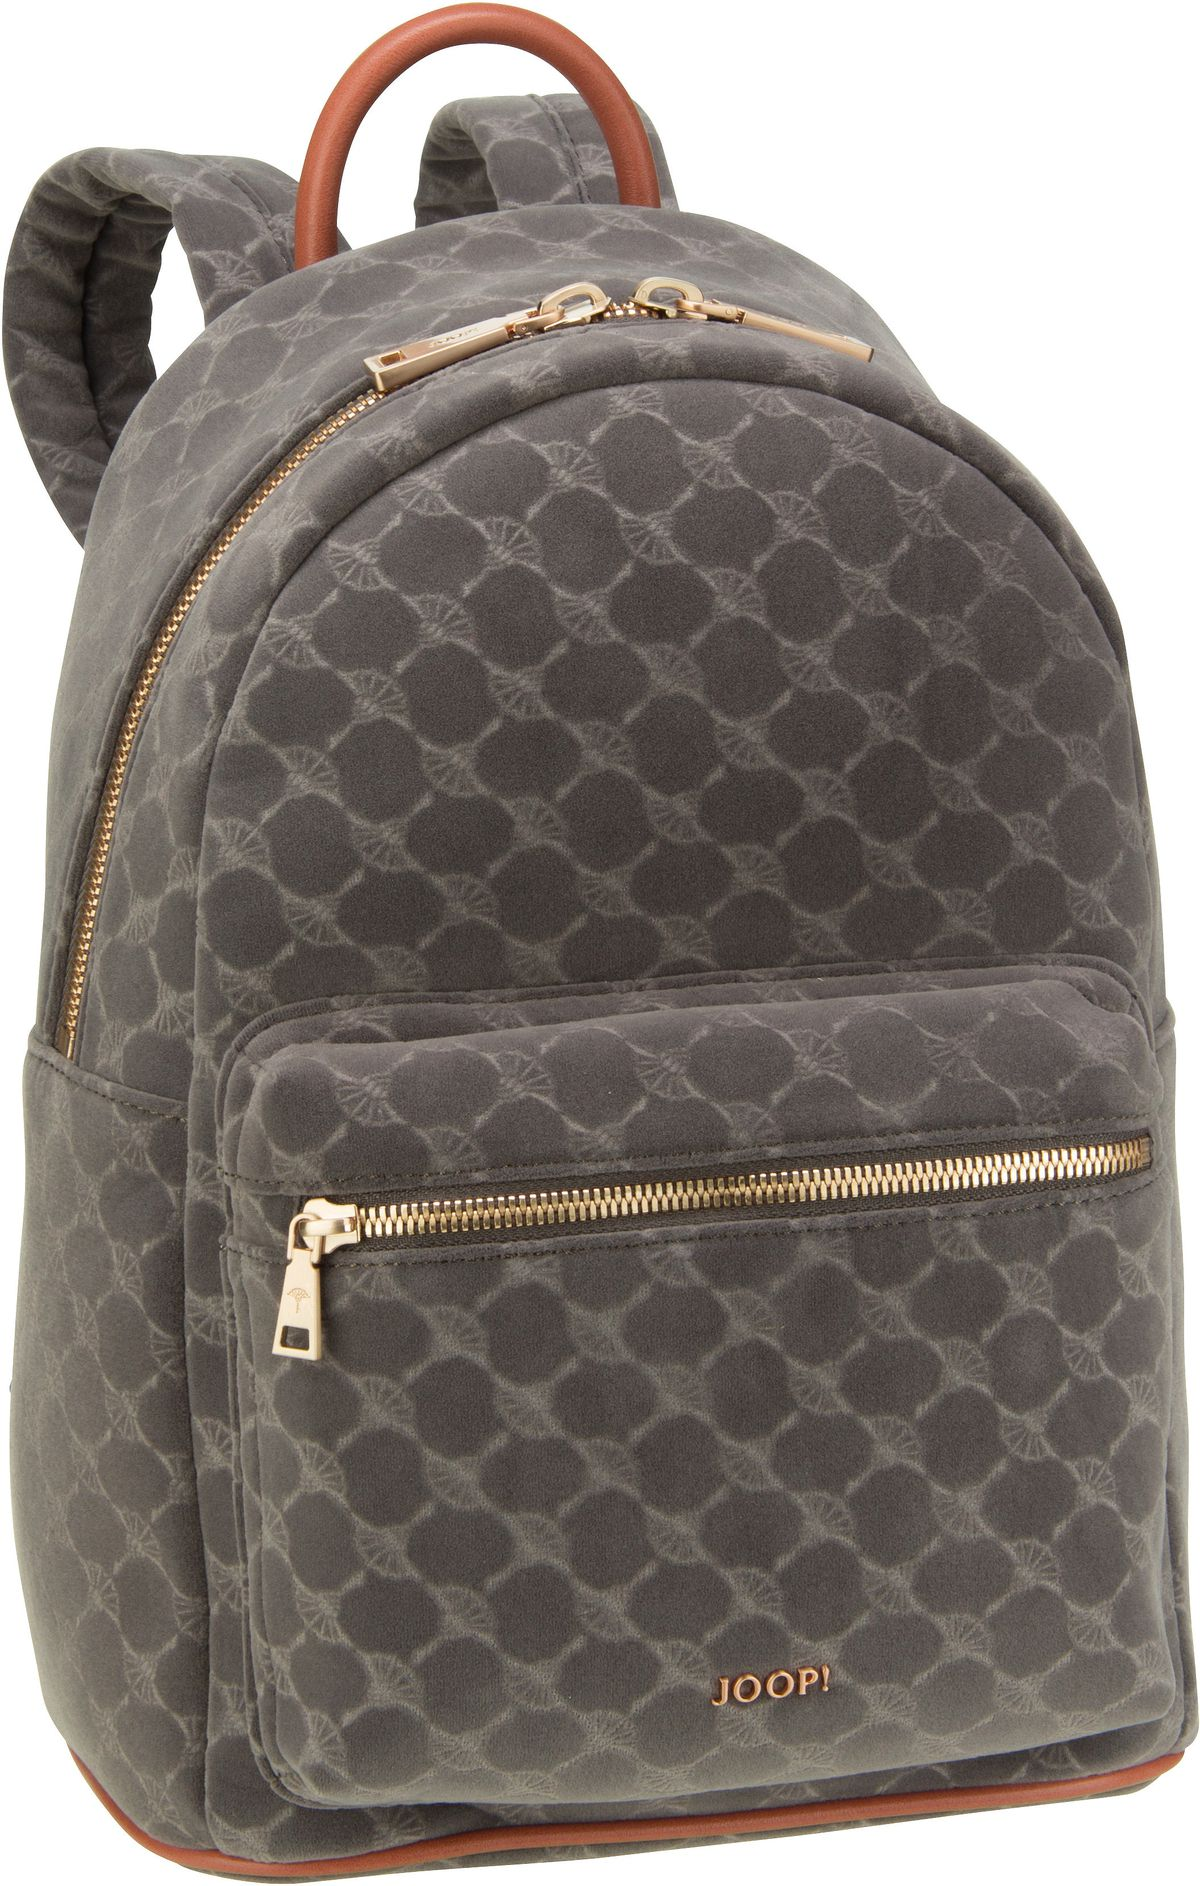 Rucksack / Daypack Serale Salome Backpack MVZ Taupe